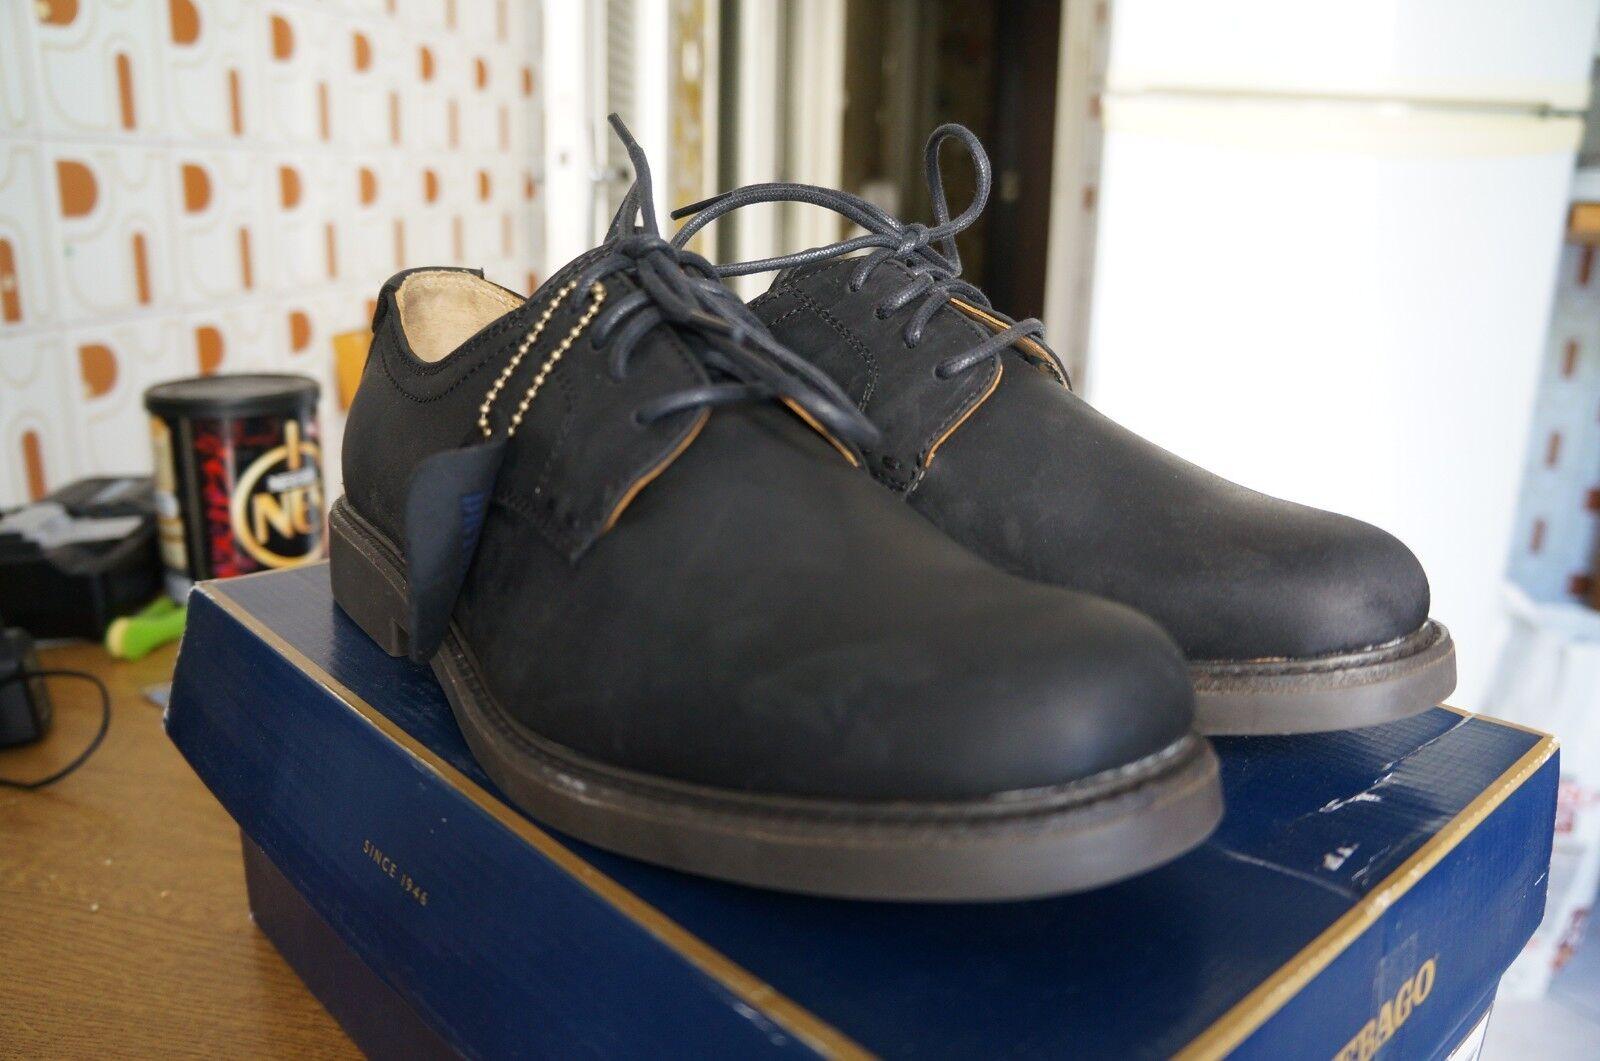 Sebago Turner Lace Up, Schuhe Stringate Basse Oxford - Uomo, noir 43.5 EU - Oxford 0262a3